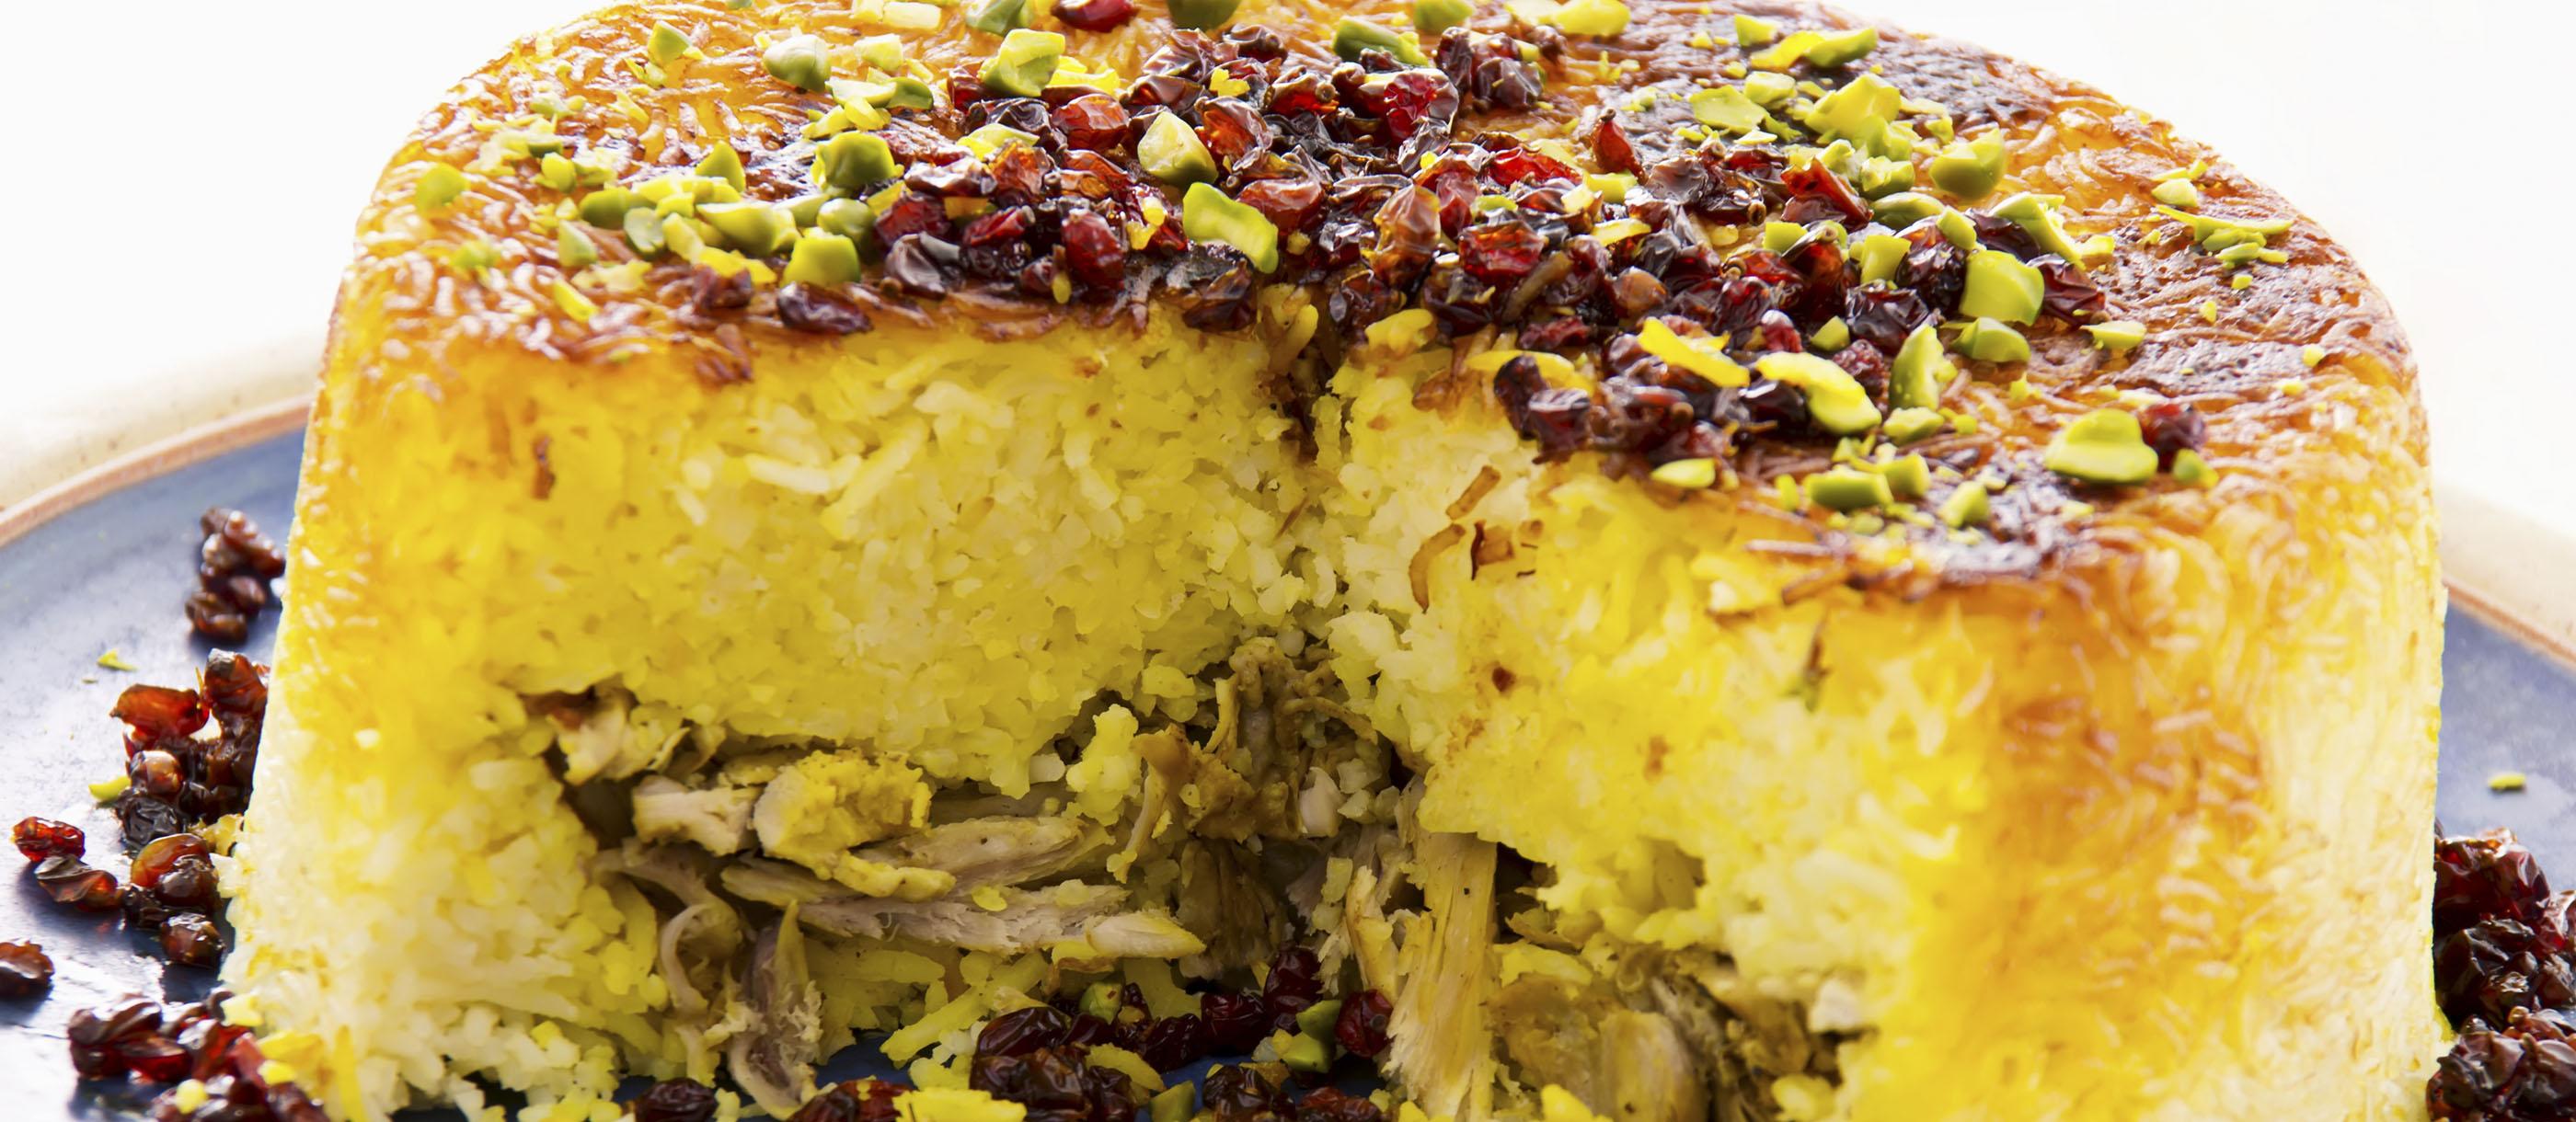 Tahchin | Traditional Rice Dish From Iran | TasteAtlas